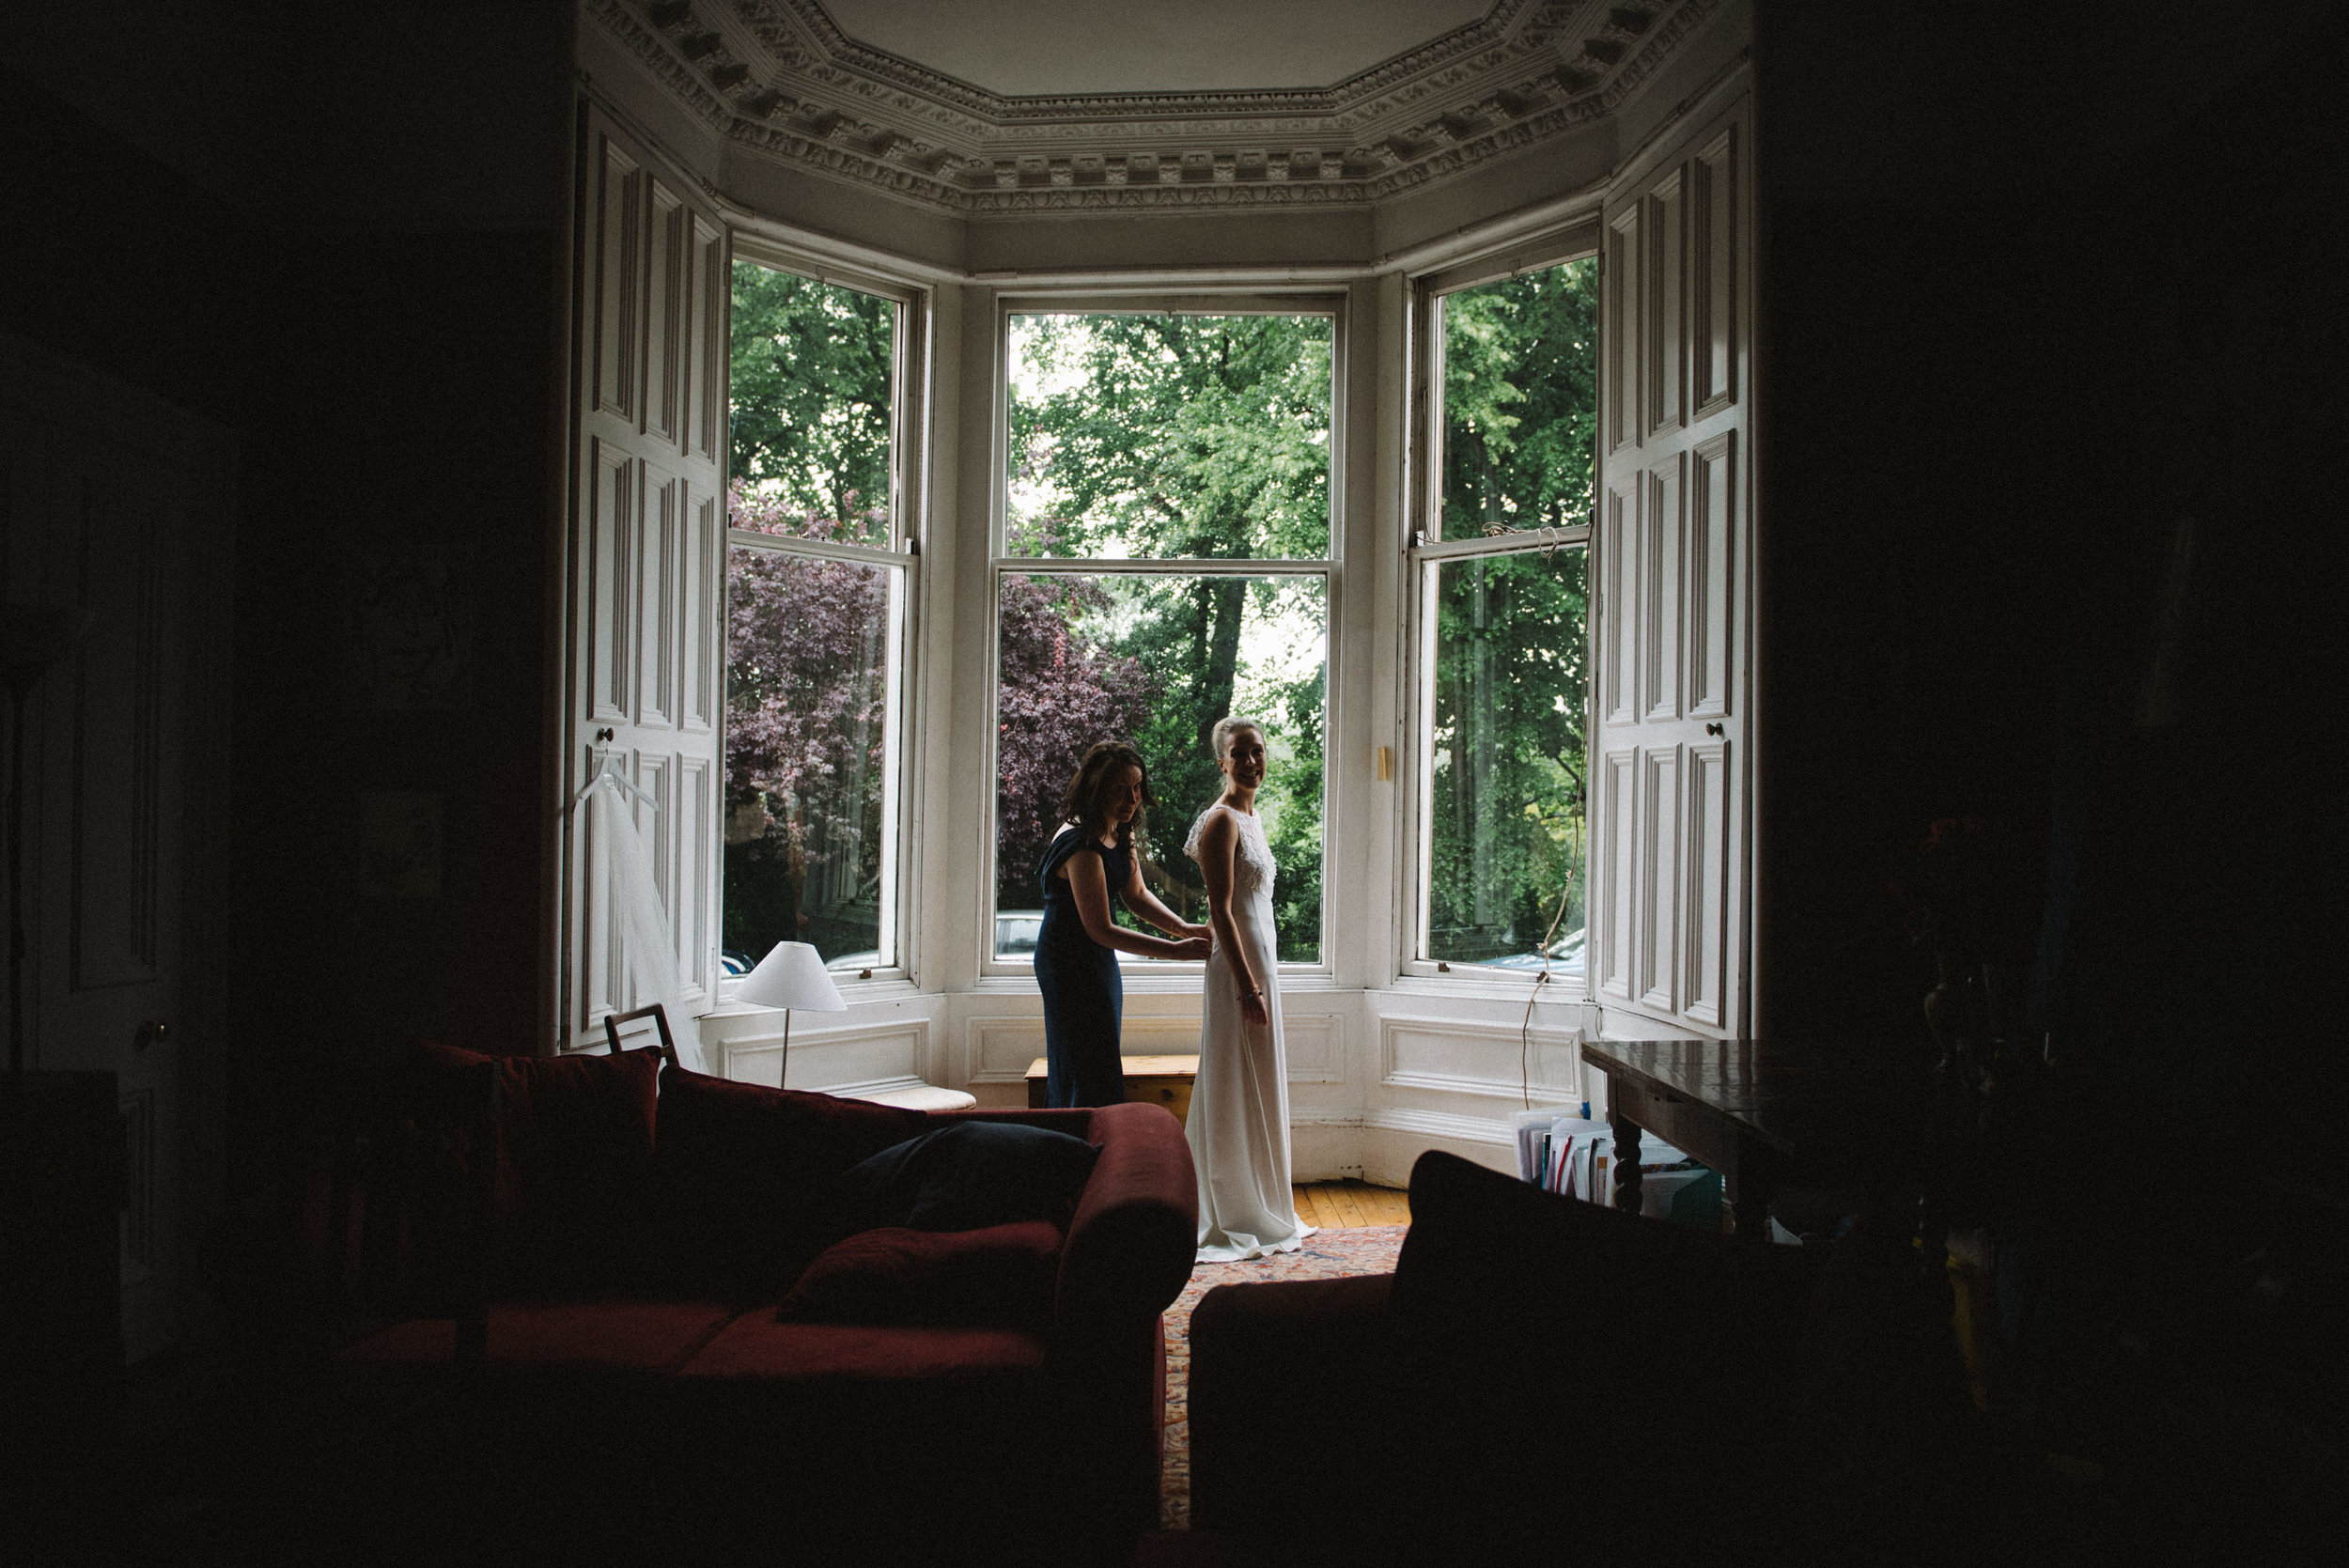 0133-LISA-DEVINE-PHOTOGRAPHY-ALTERNATIVE-WEDDING-PHOTOGRAPHY-SCOTLAND-DESTINATION-WEDDINGS-GLASGOW-WEDDINGS-COOL-WEDDINGS-STYLISH-WEDDINGS.JPG